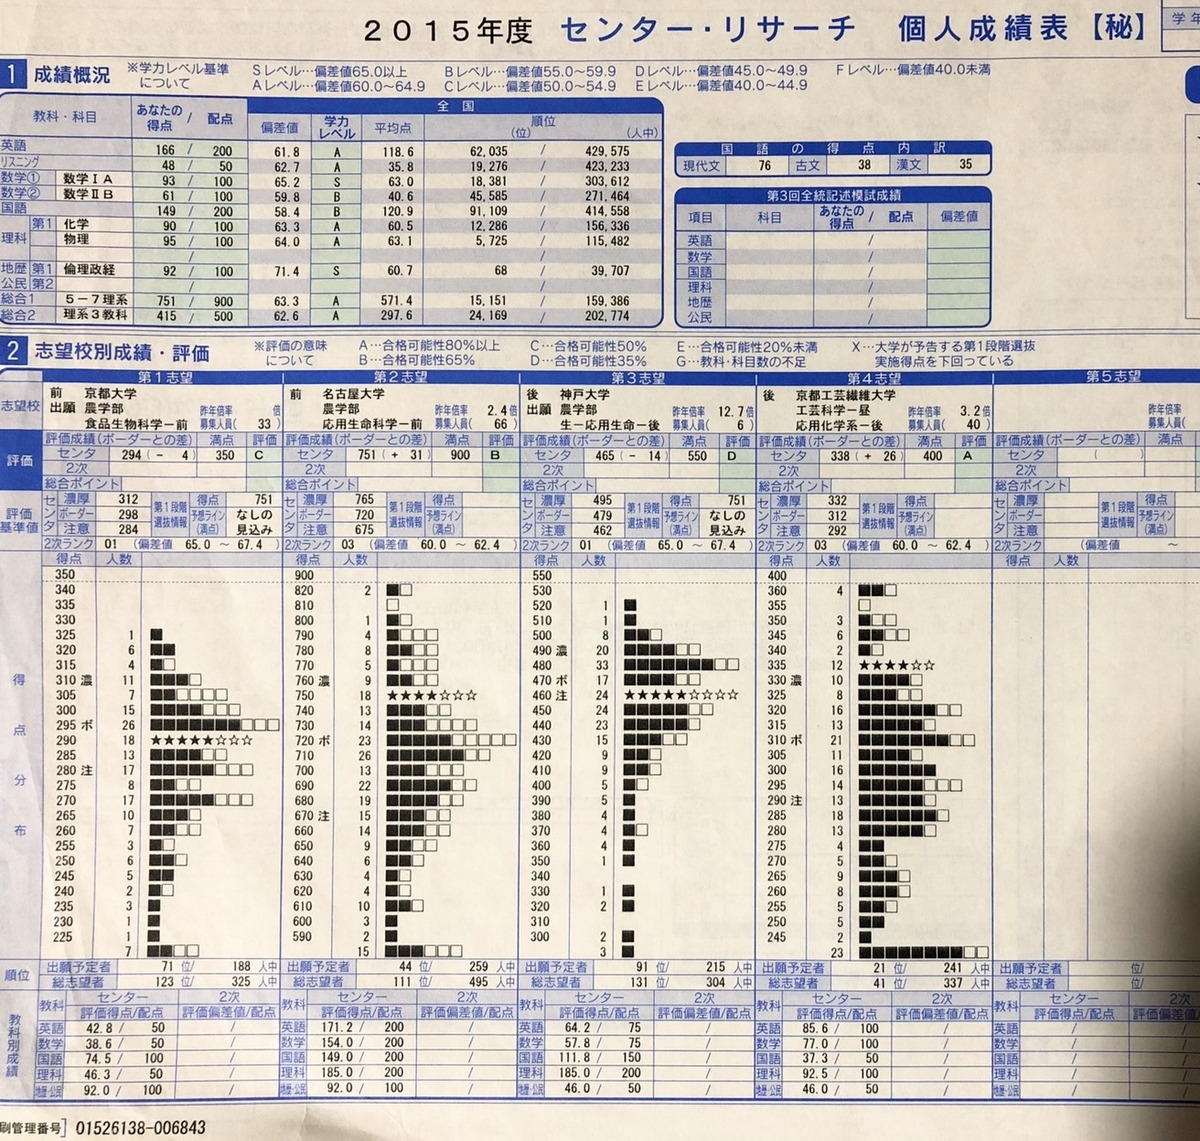 f:id:TsutayaP:20200312095817j:plain